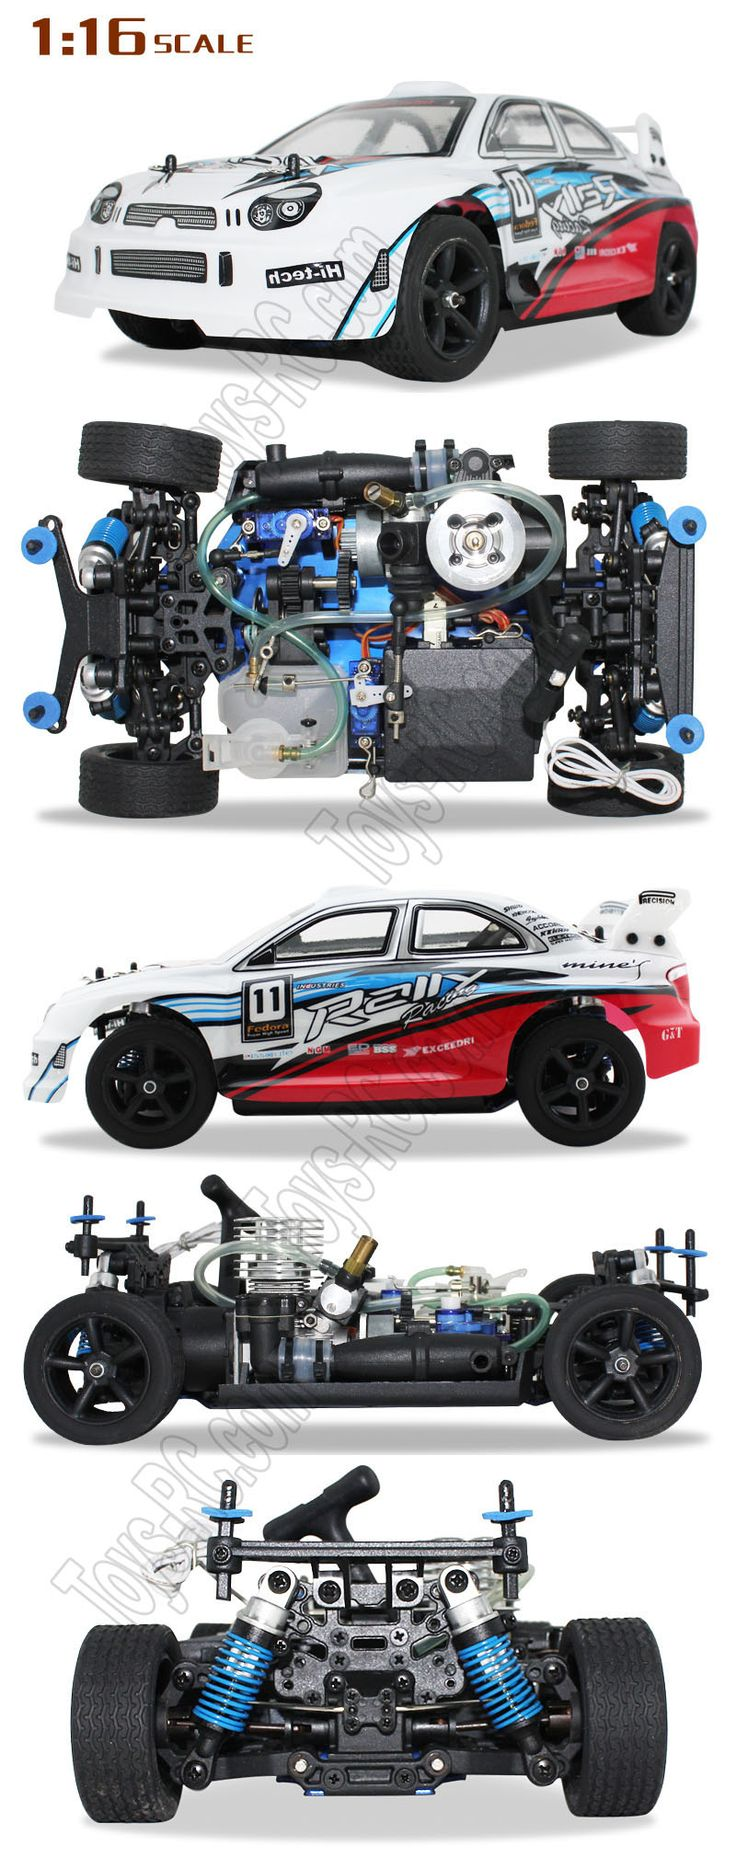 Victory hawk vh z16 1 16 4wd nitro rc gas racing car http